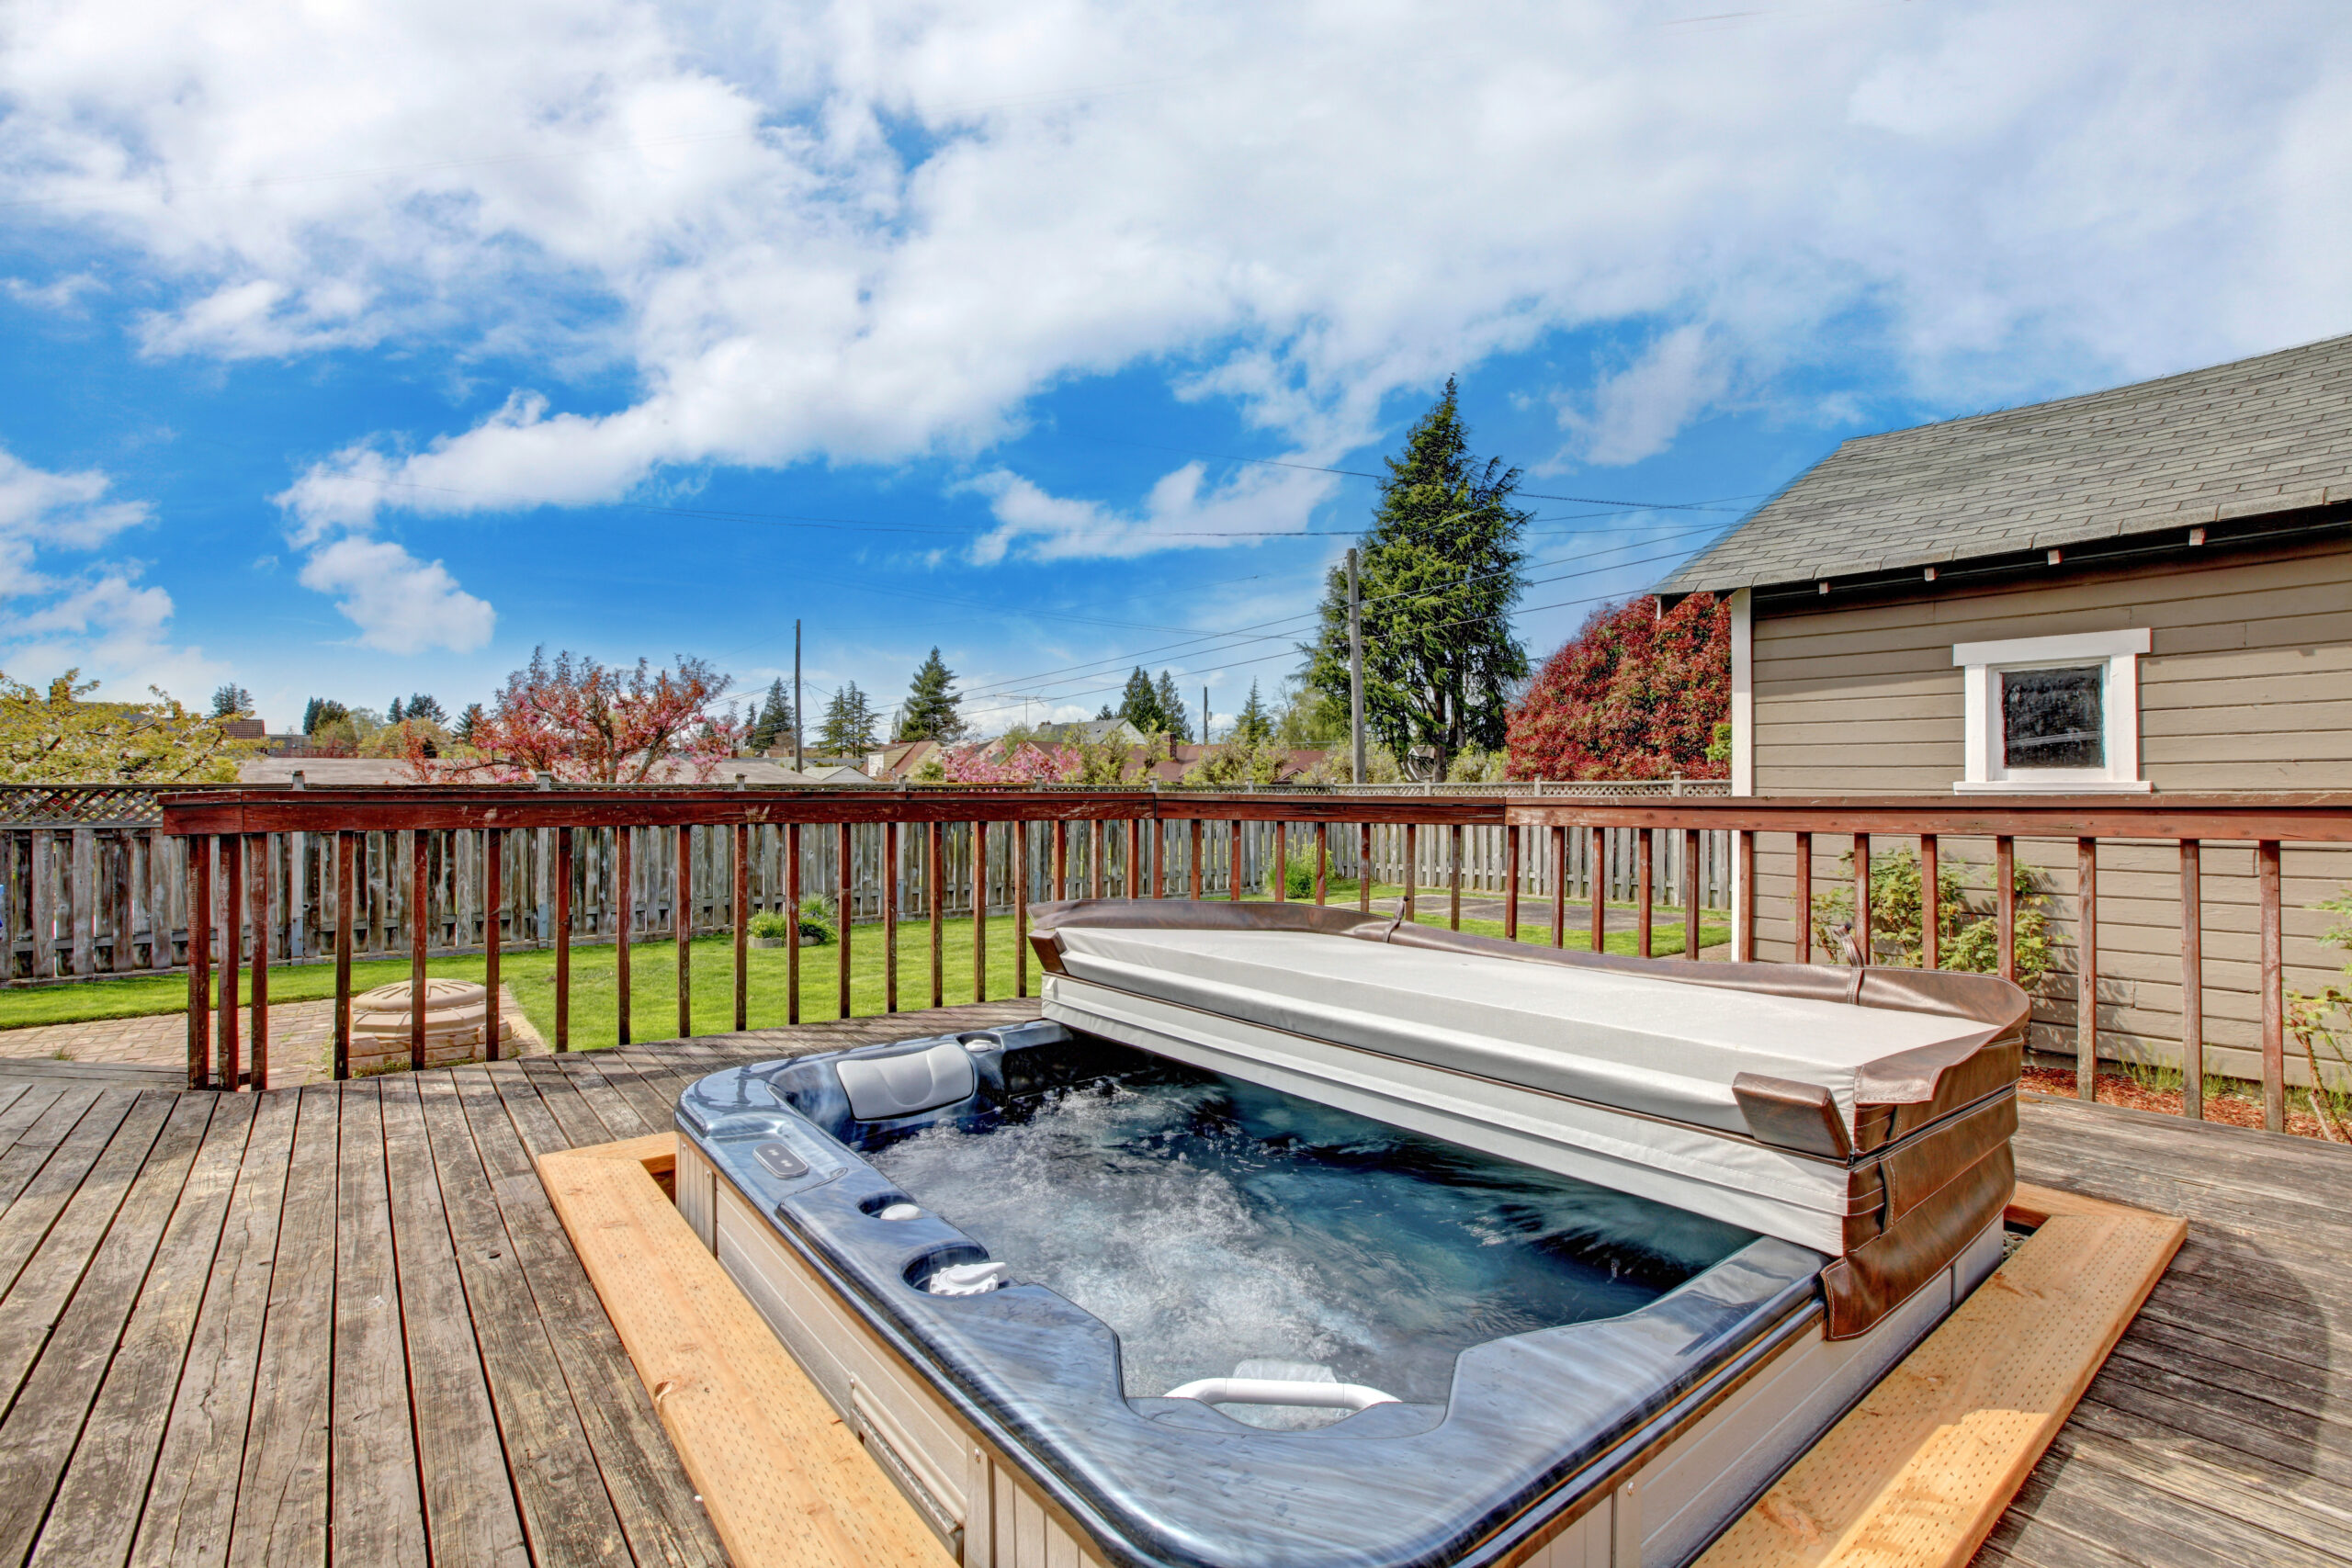 spa sur un balcon de bois